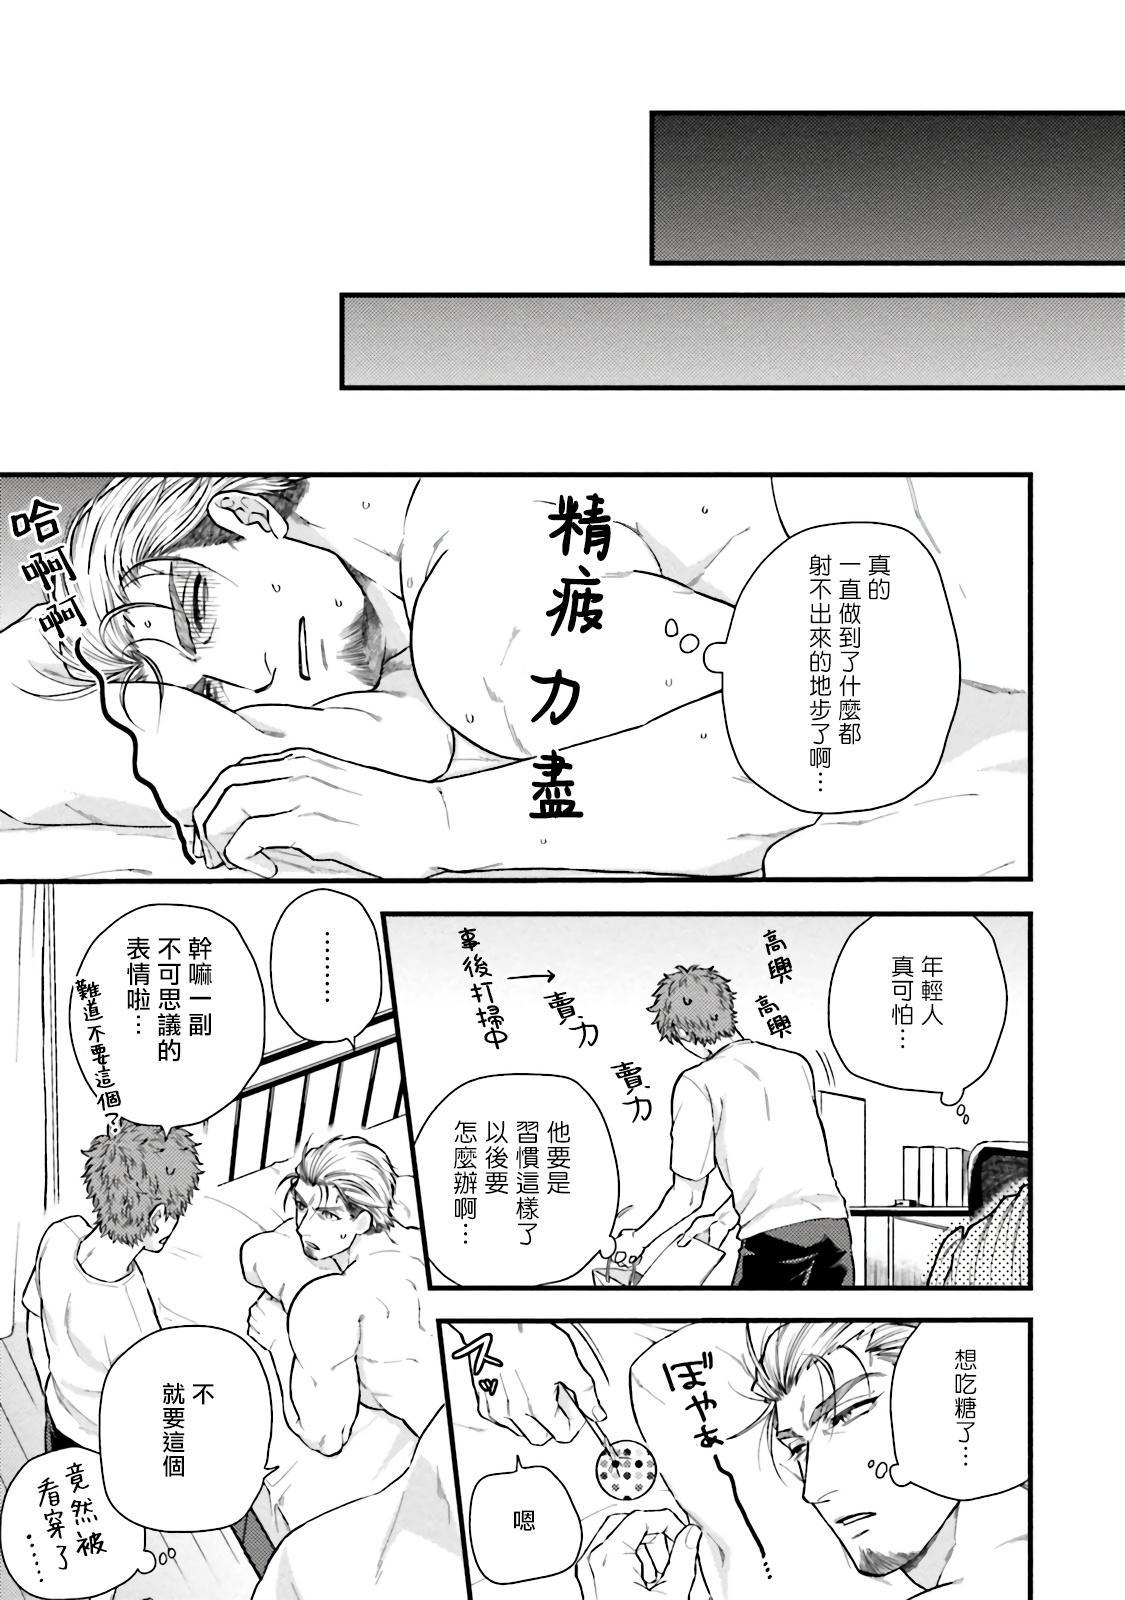 Kinou wa Otanoshimi Deshita ne | 昨天过得很愉快吧 Ch. 1-4+特典 81